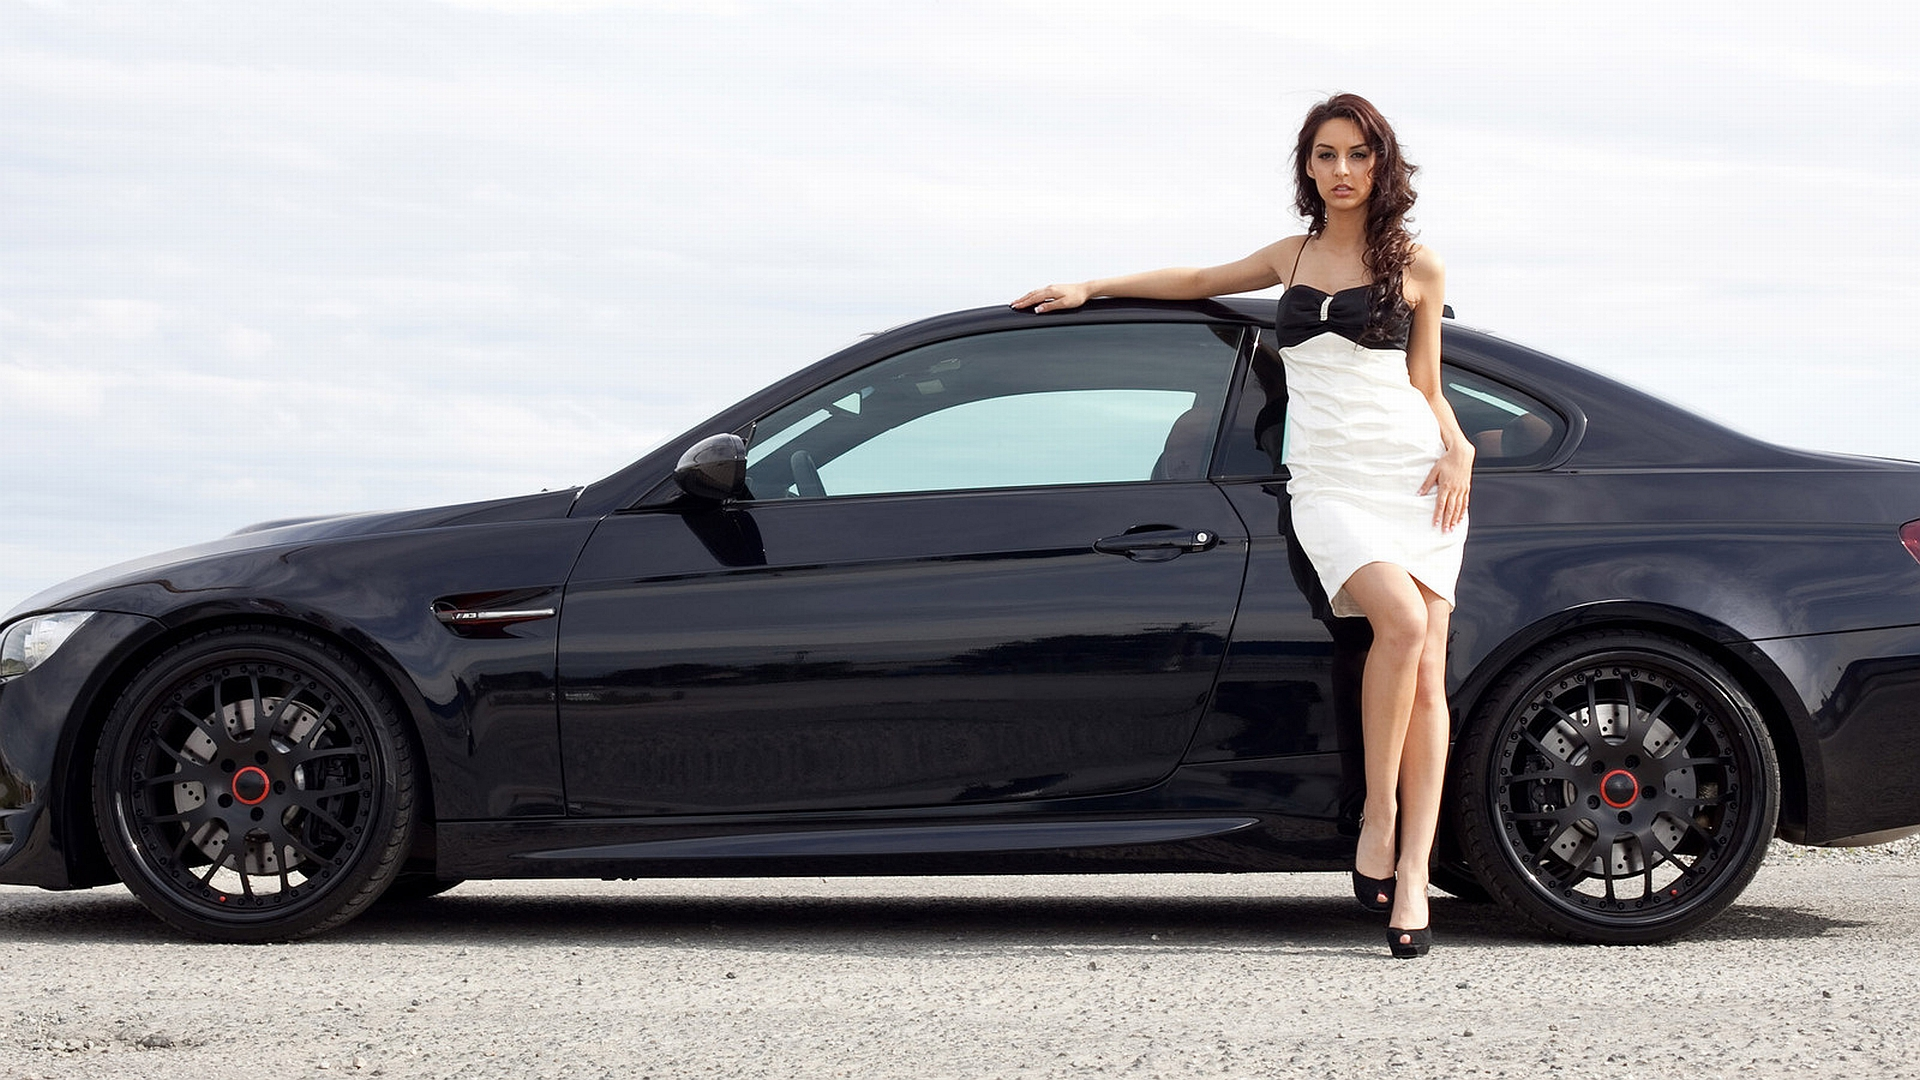 Girls & Cars HD Wall